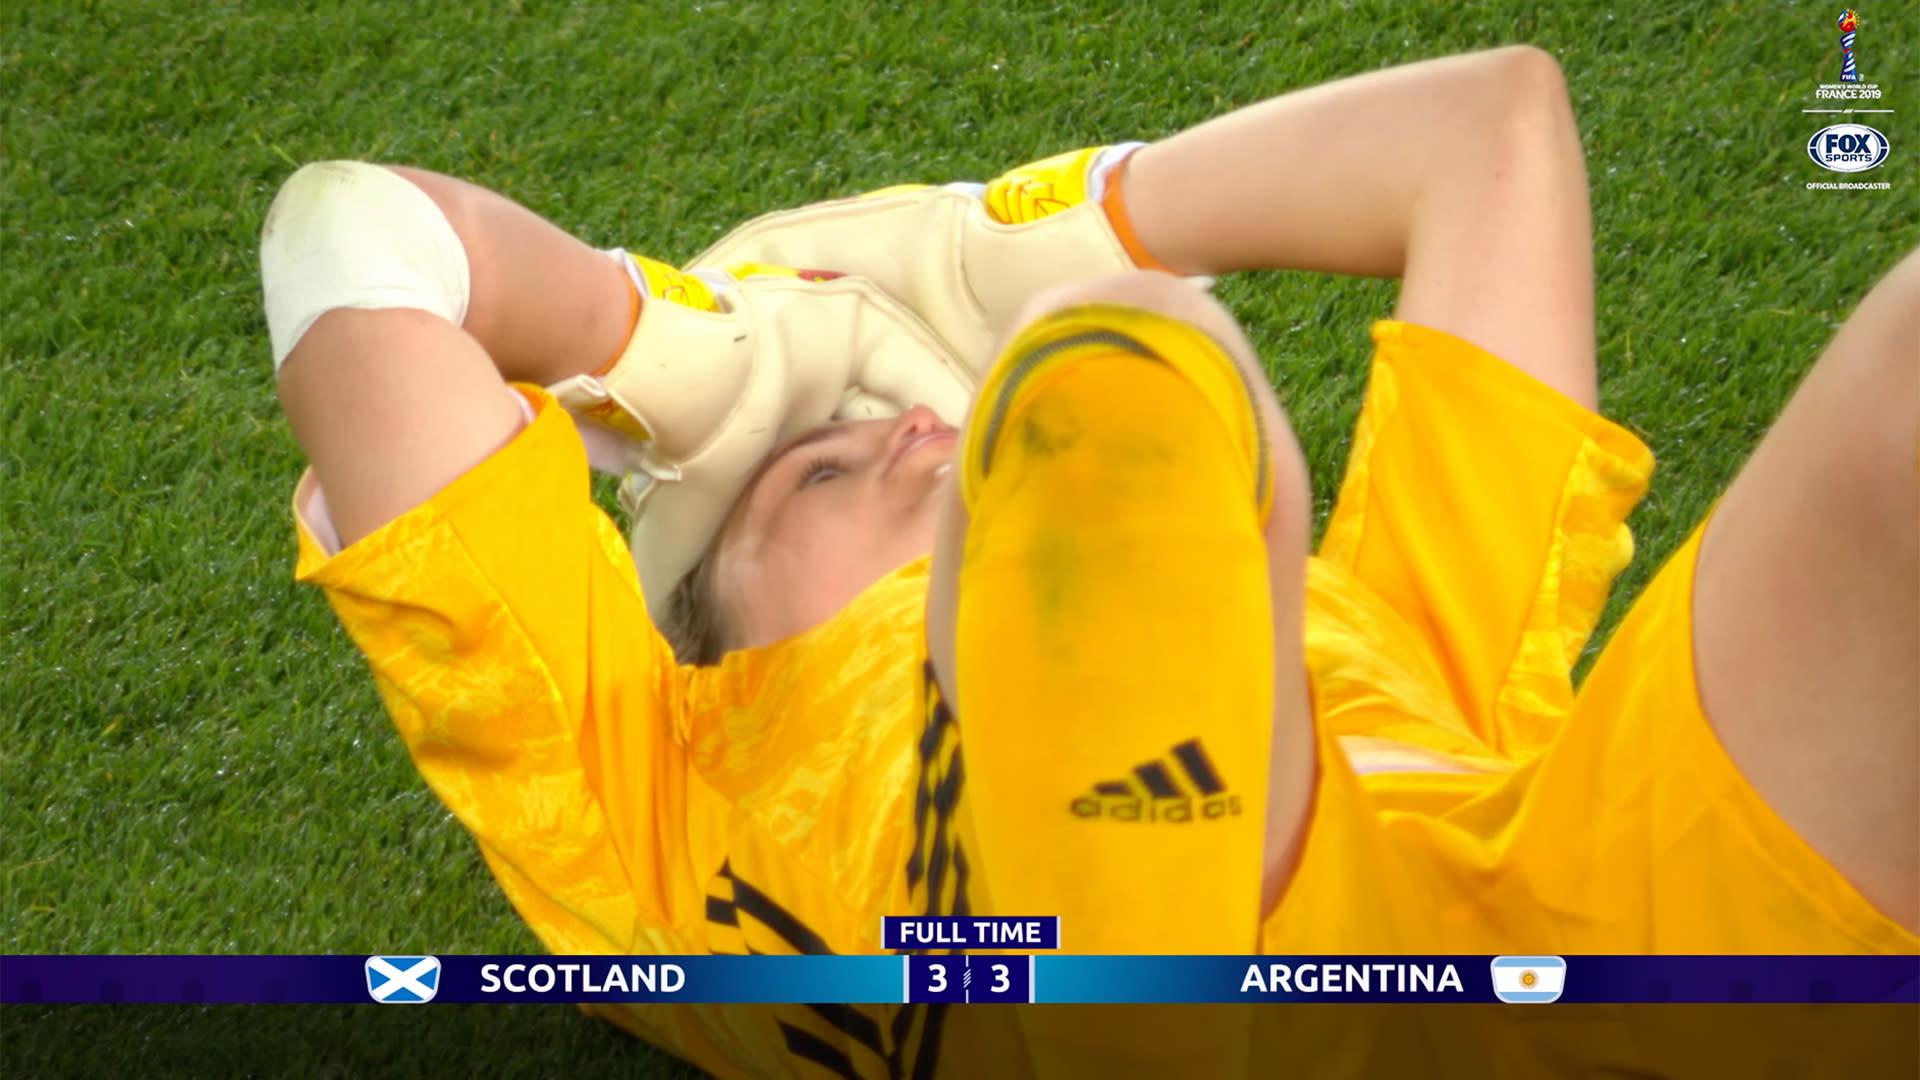 Women's World Cup – Argentina 3, Scotland 3